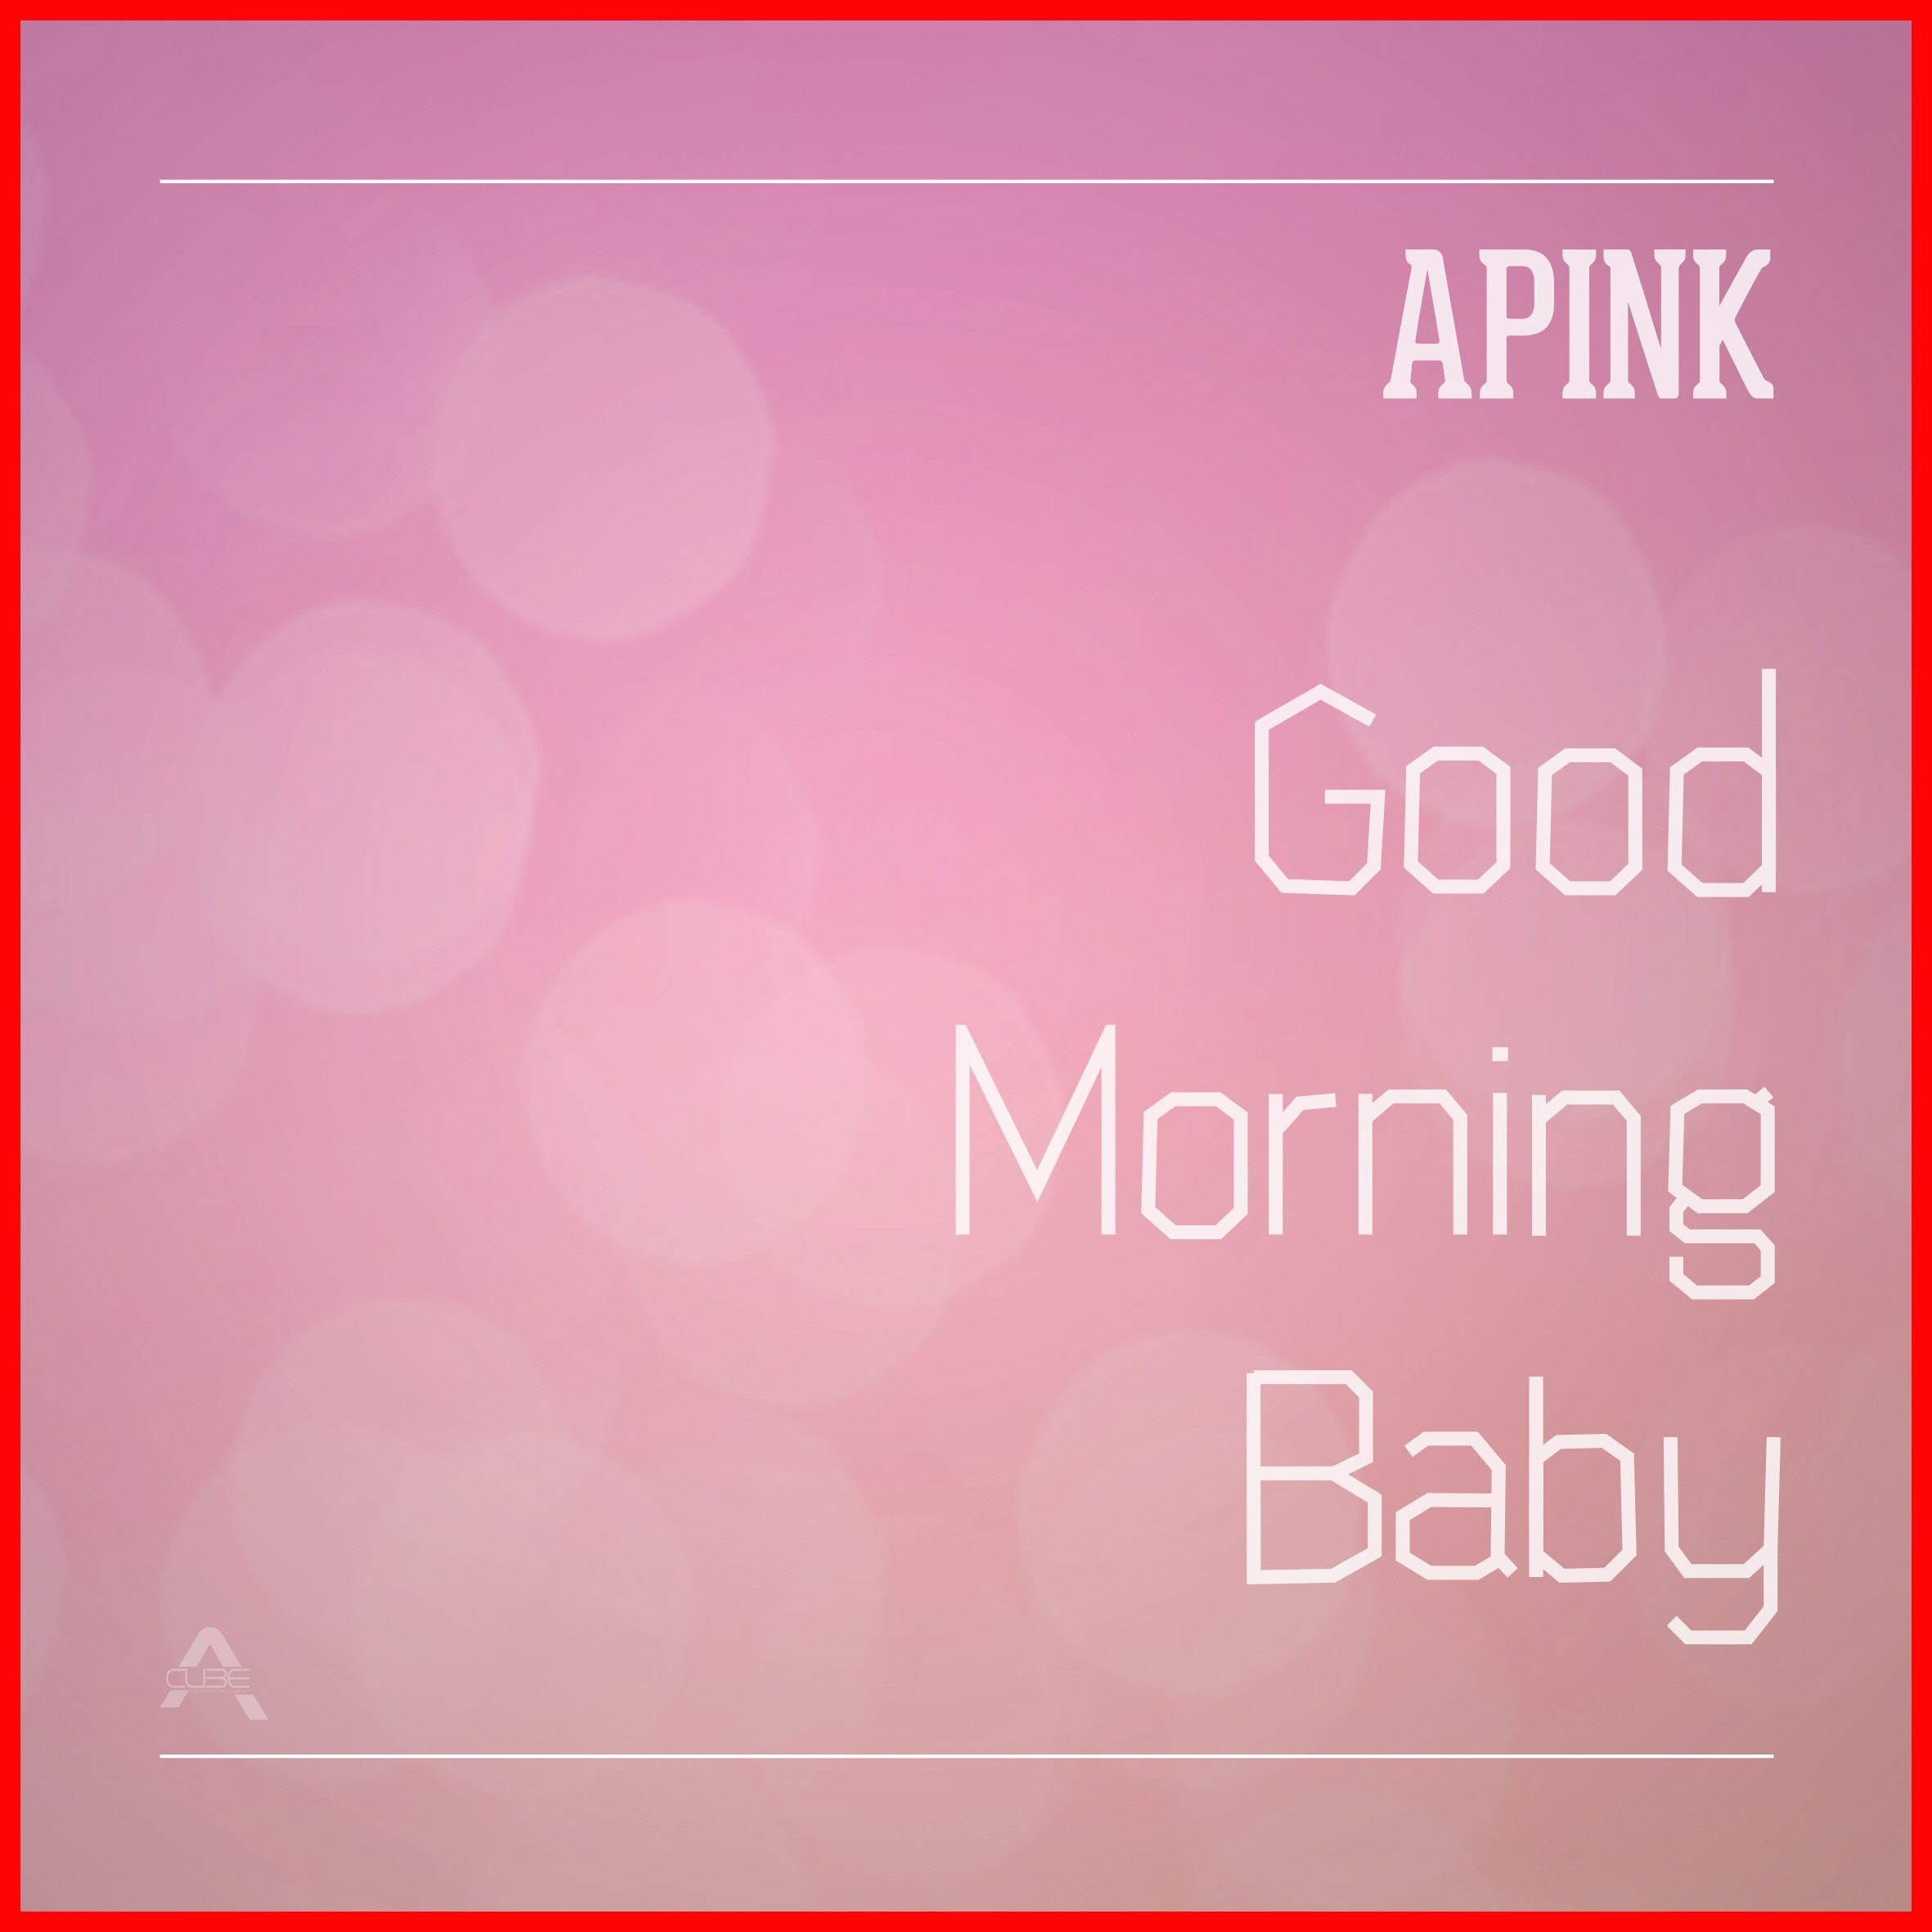 Good Morning In Korean Slang : Download single apink good morning baby mp itunes